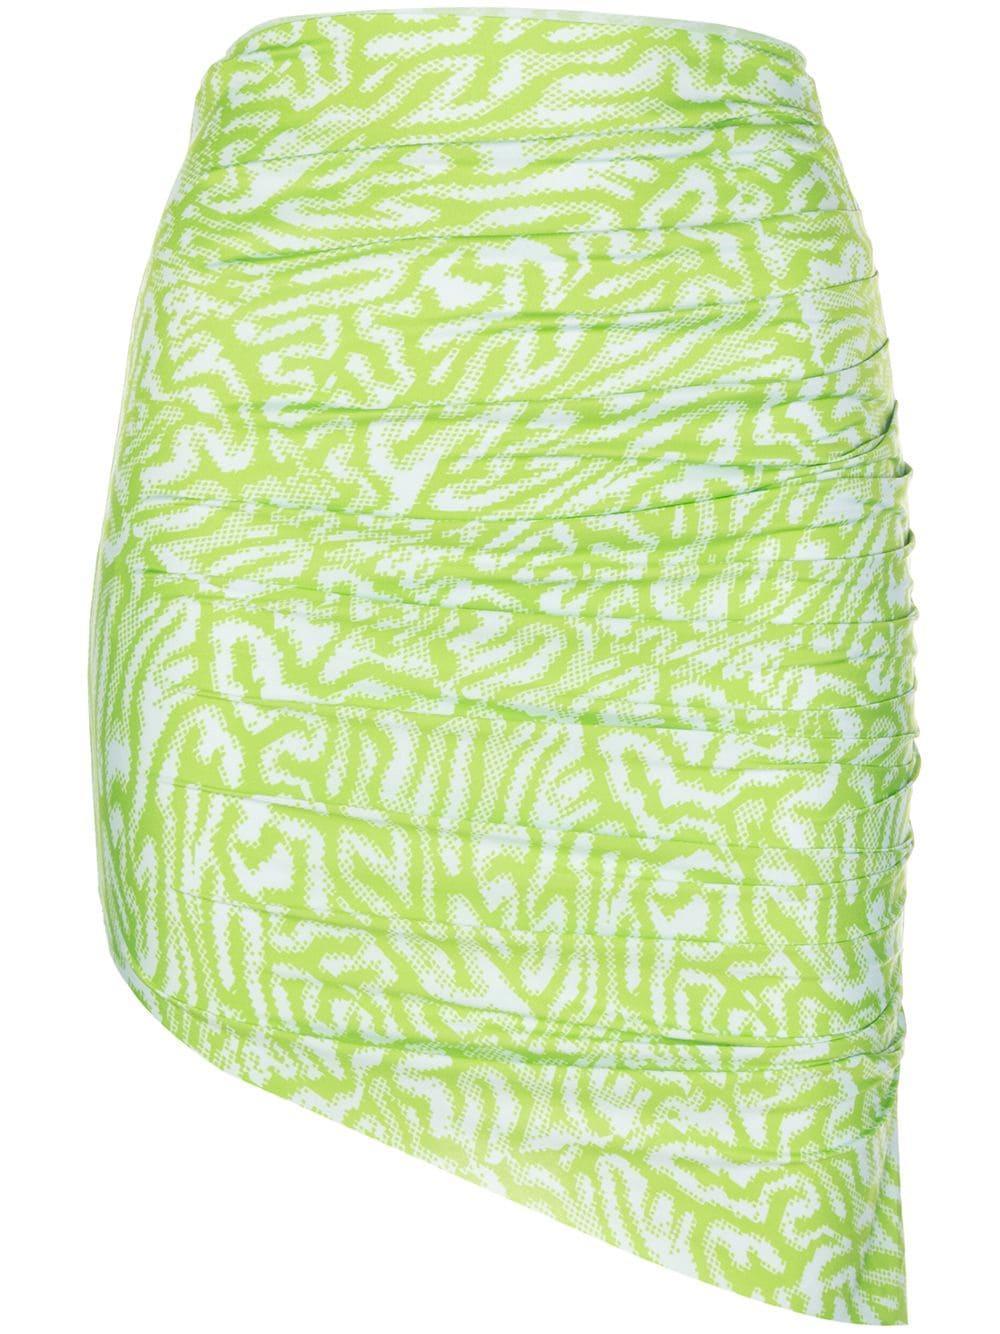 Maisie Wilen graphic-print asymmetric skirt